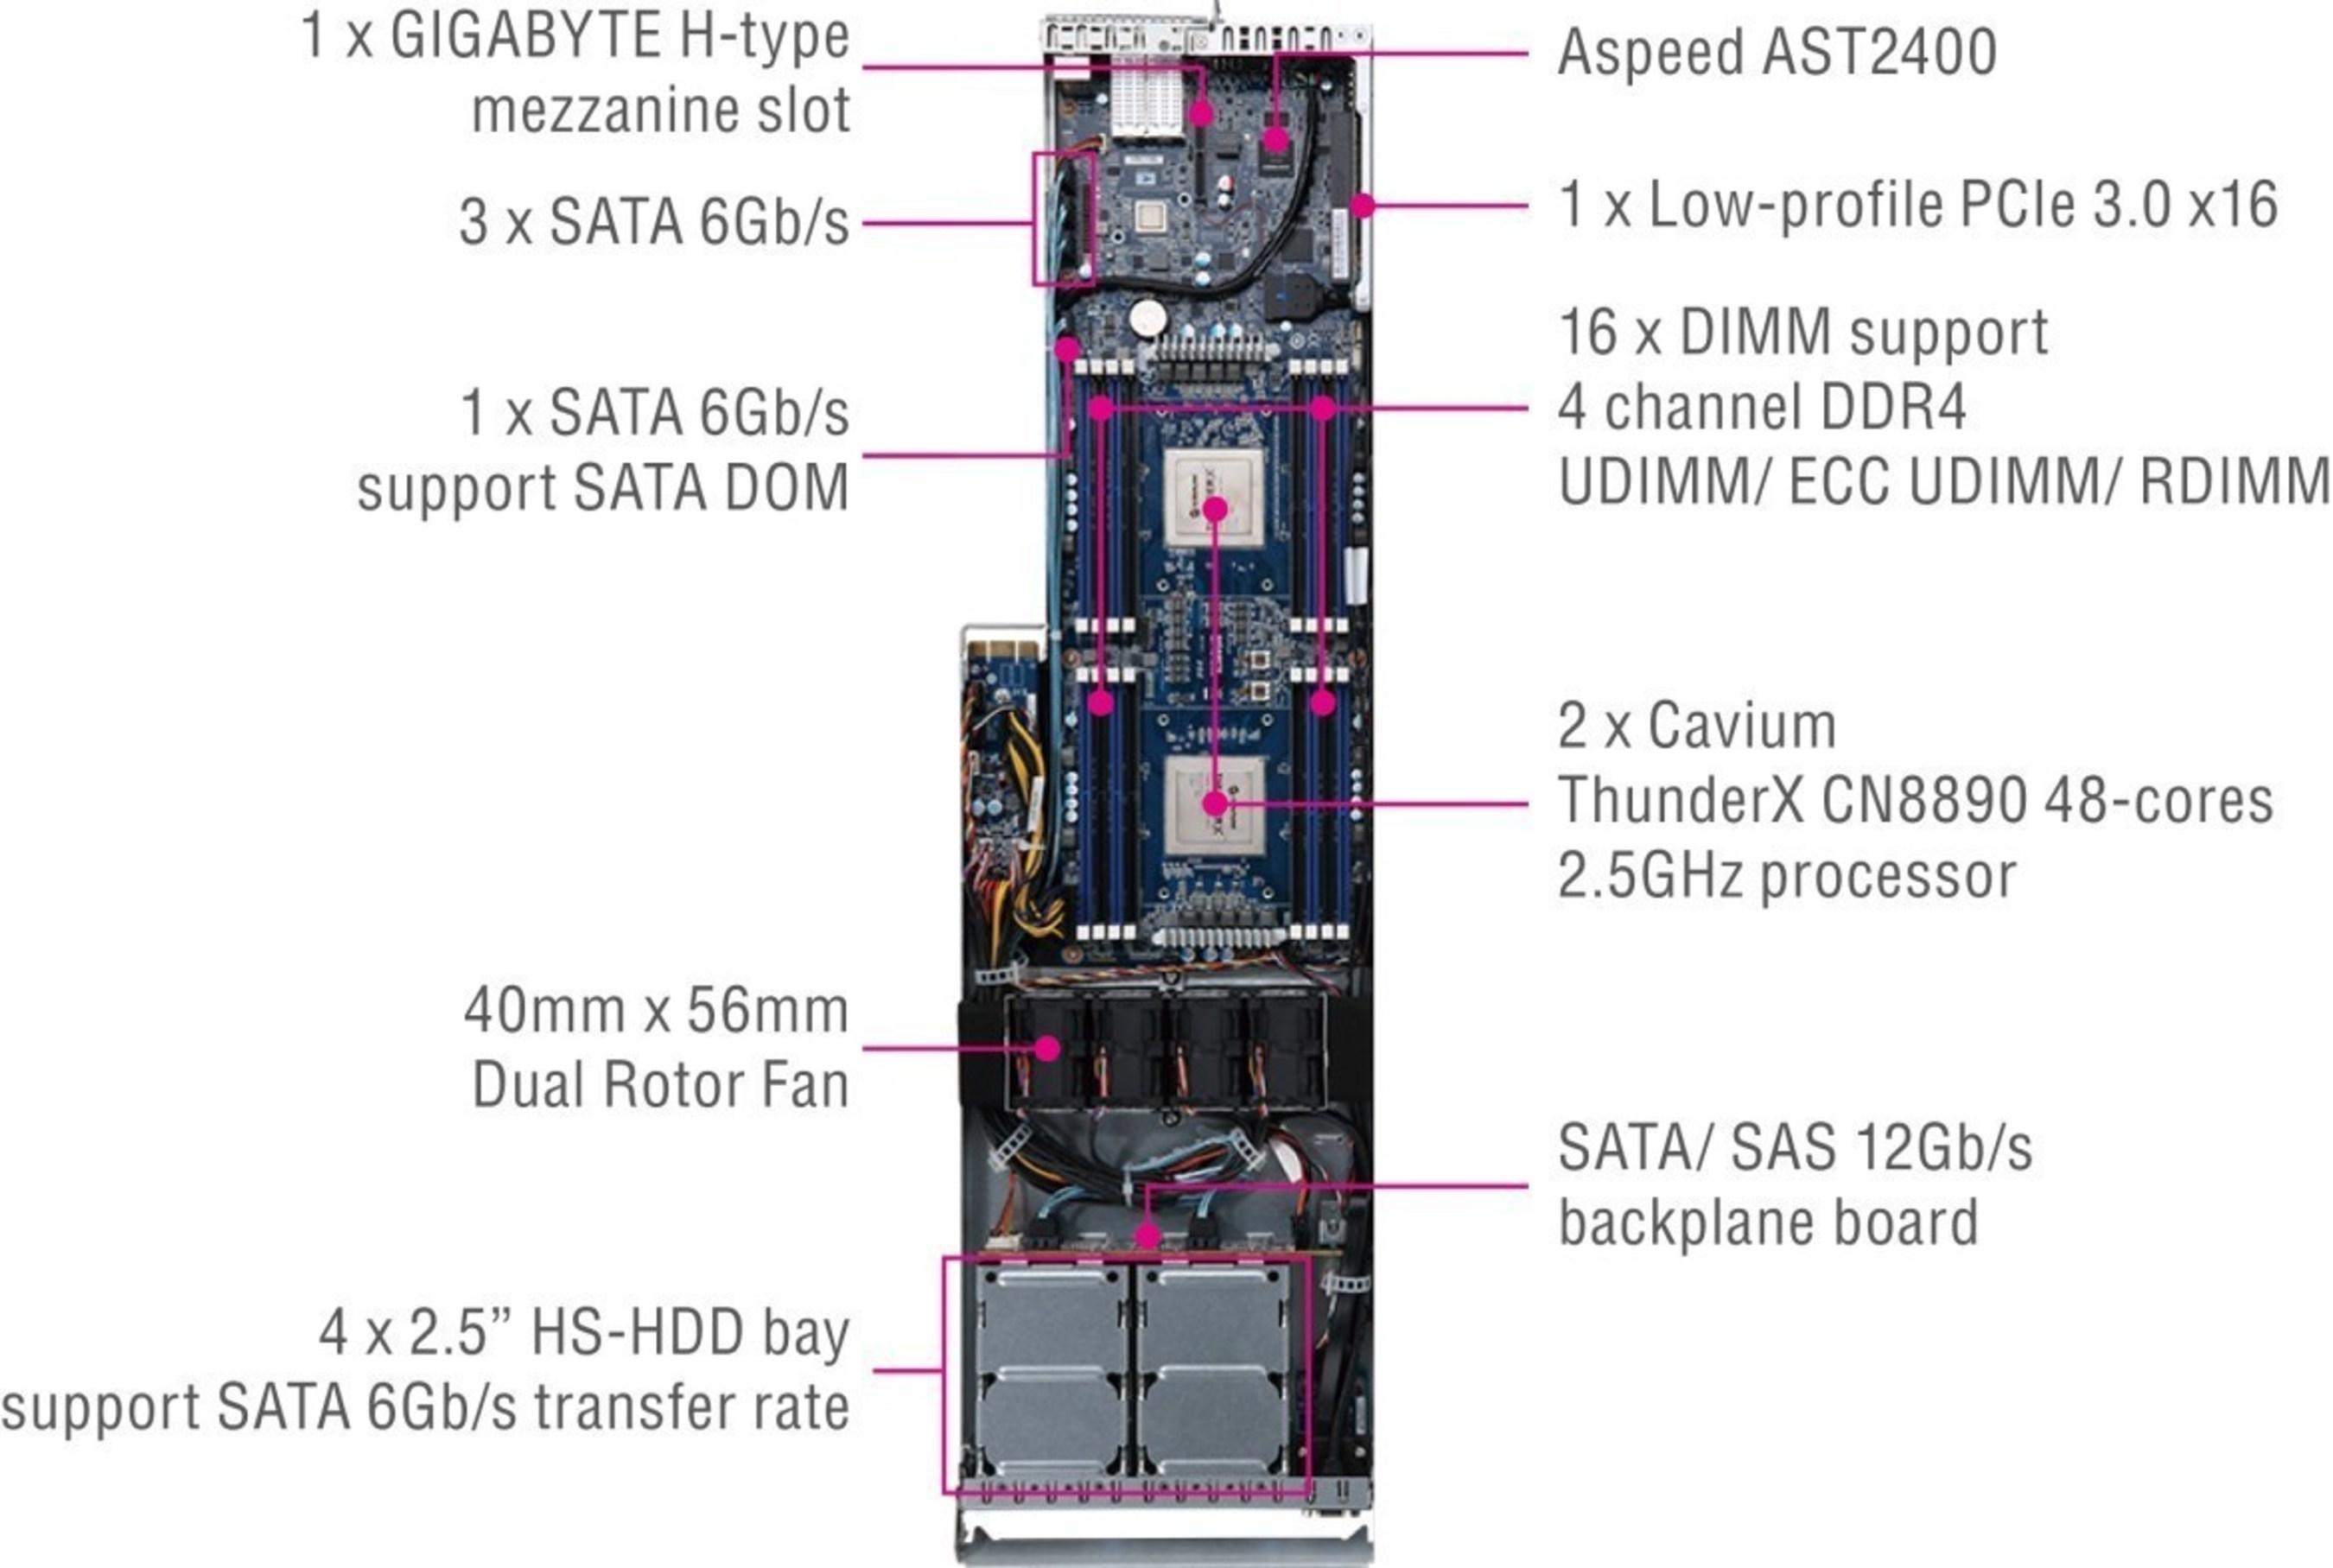 MT70-HD0 Dual Socket Motherboard